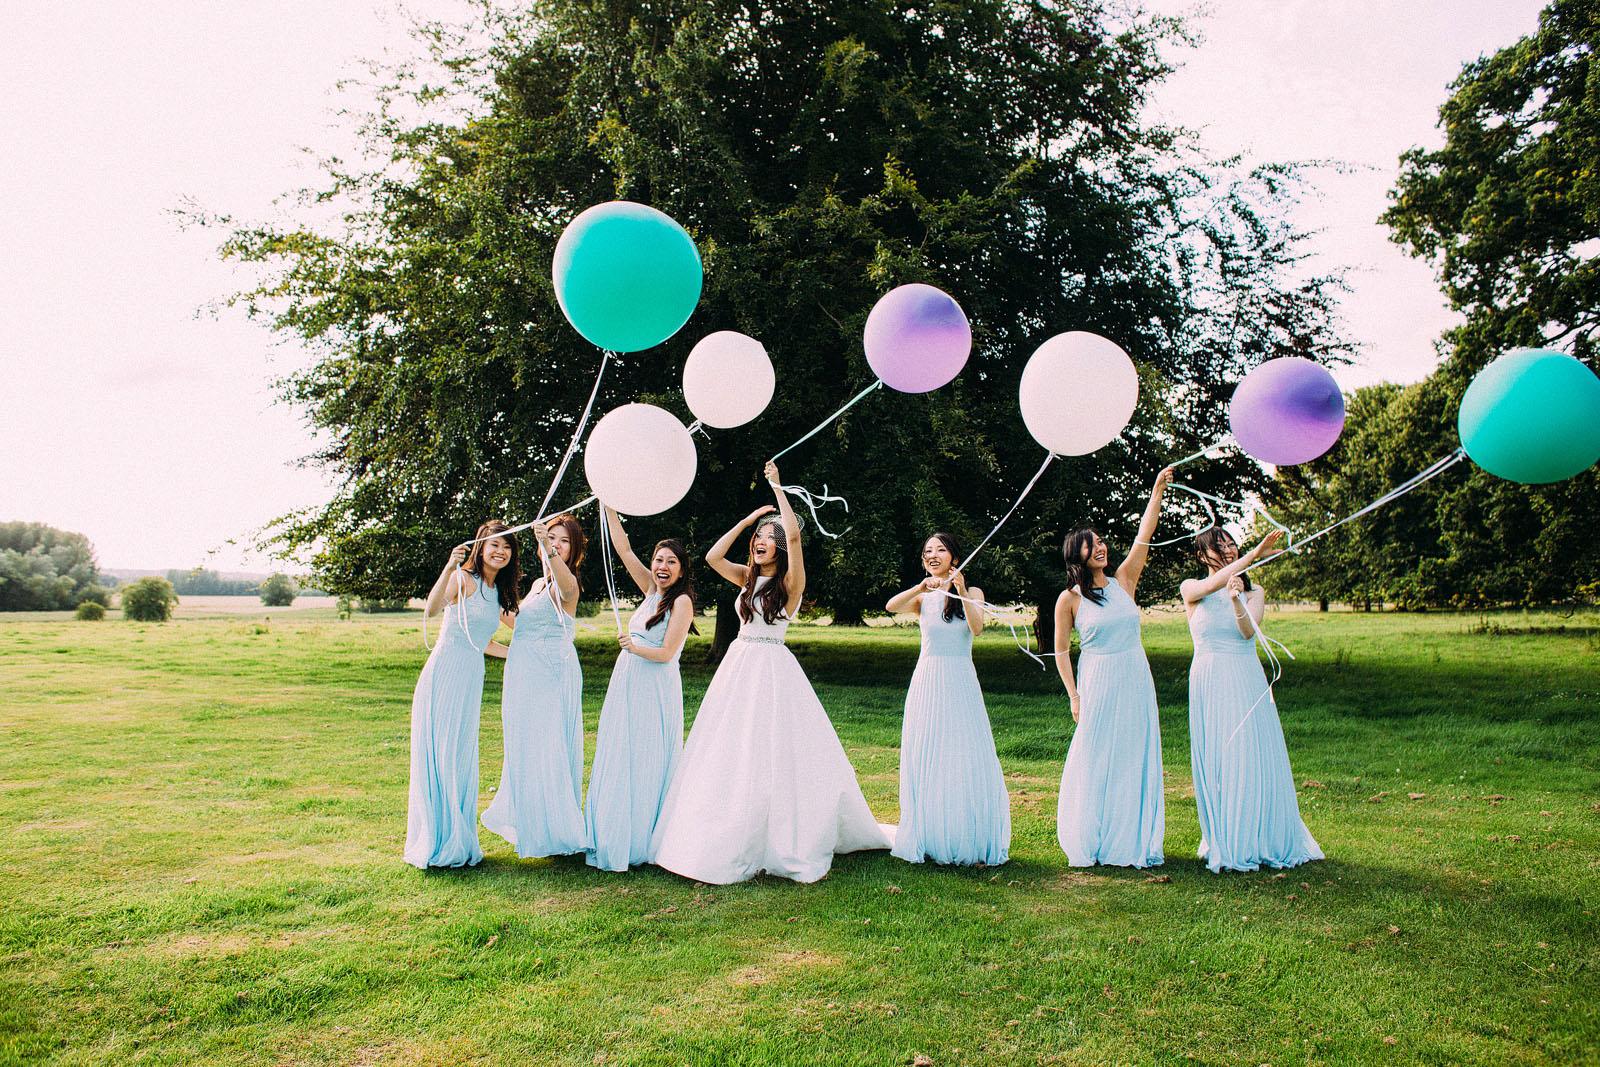 Lawson_Best_Wedding_2015_030